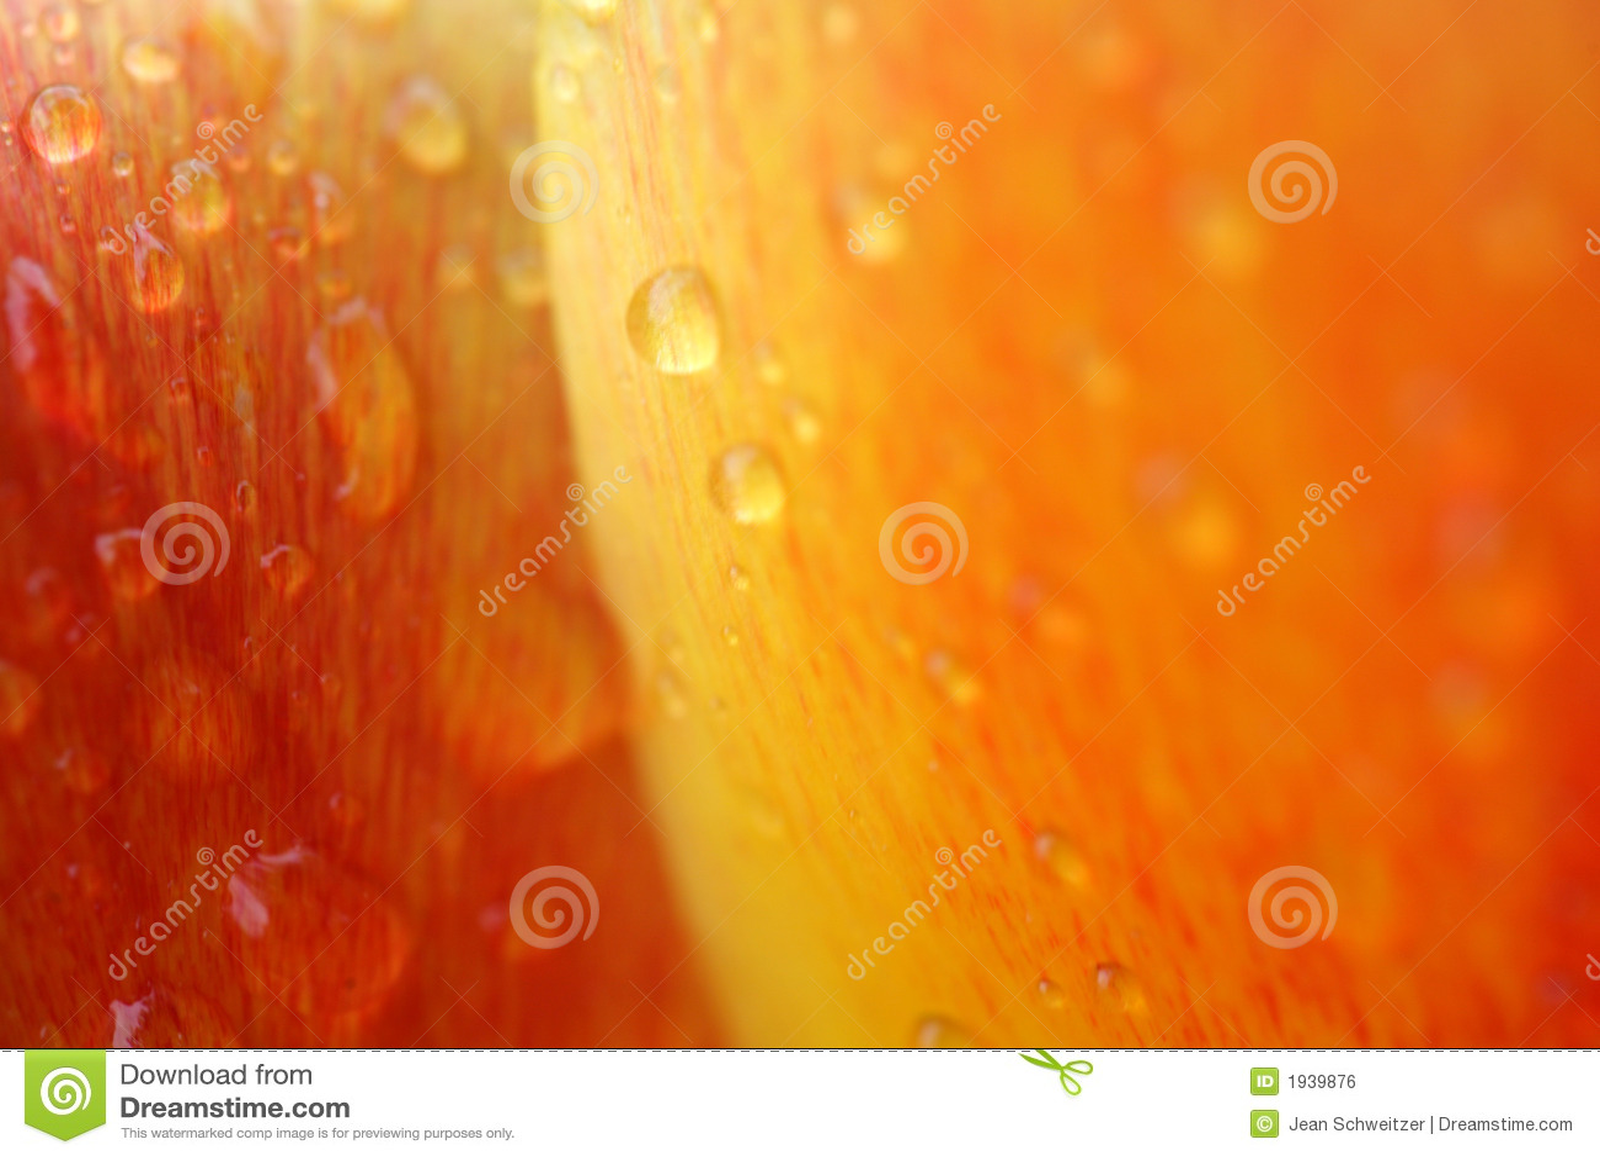 Tulipes de l eau